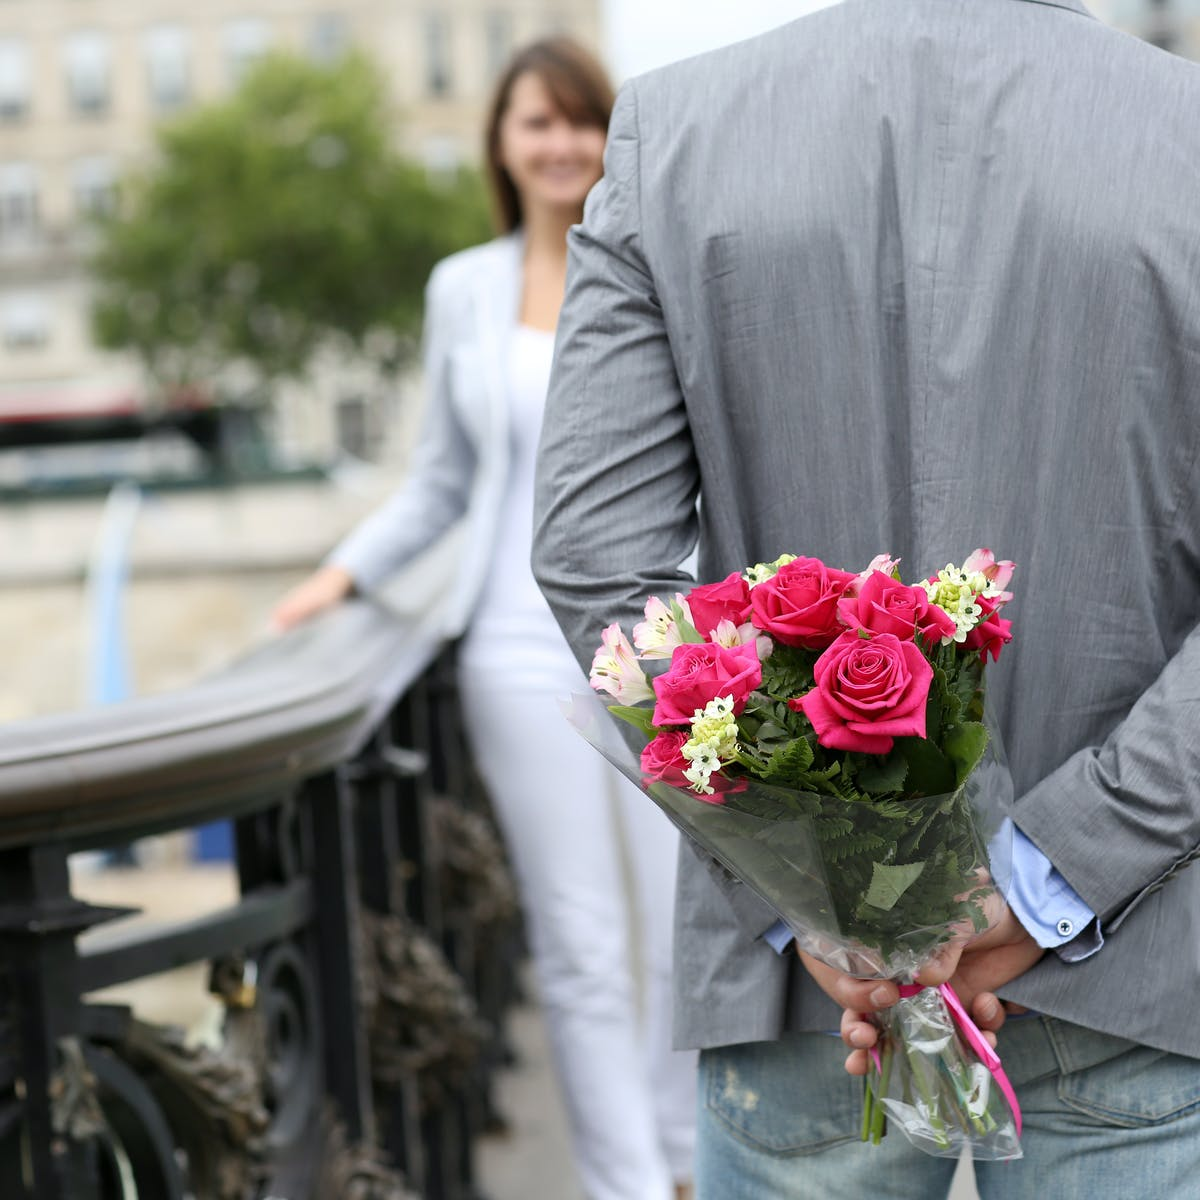 Dating Man Flower Charleroi Man Intalnire